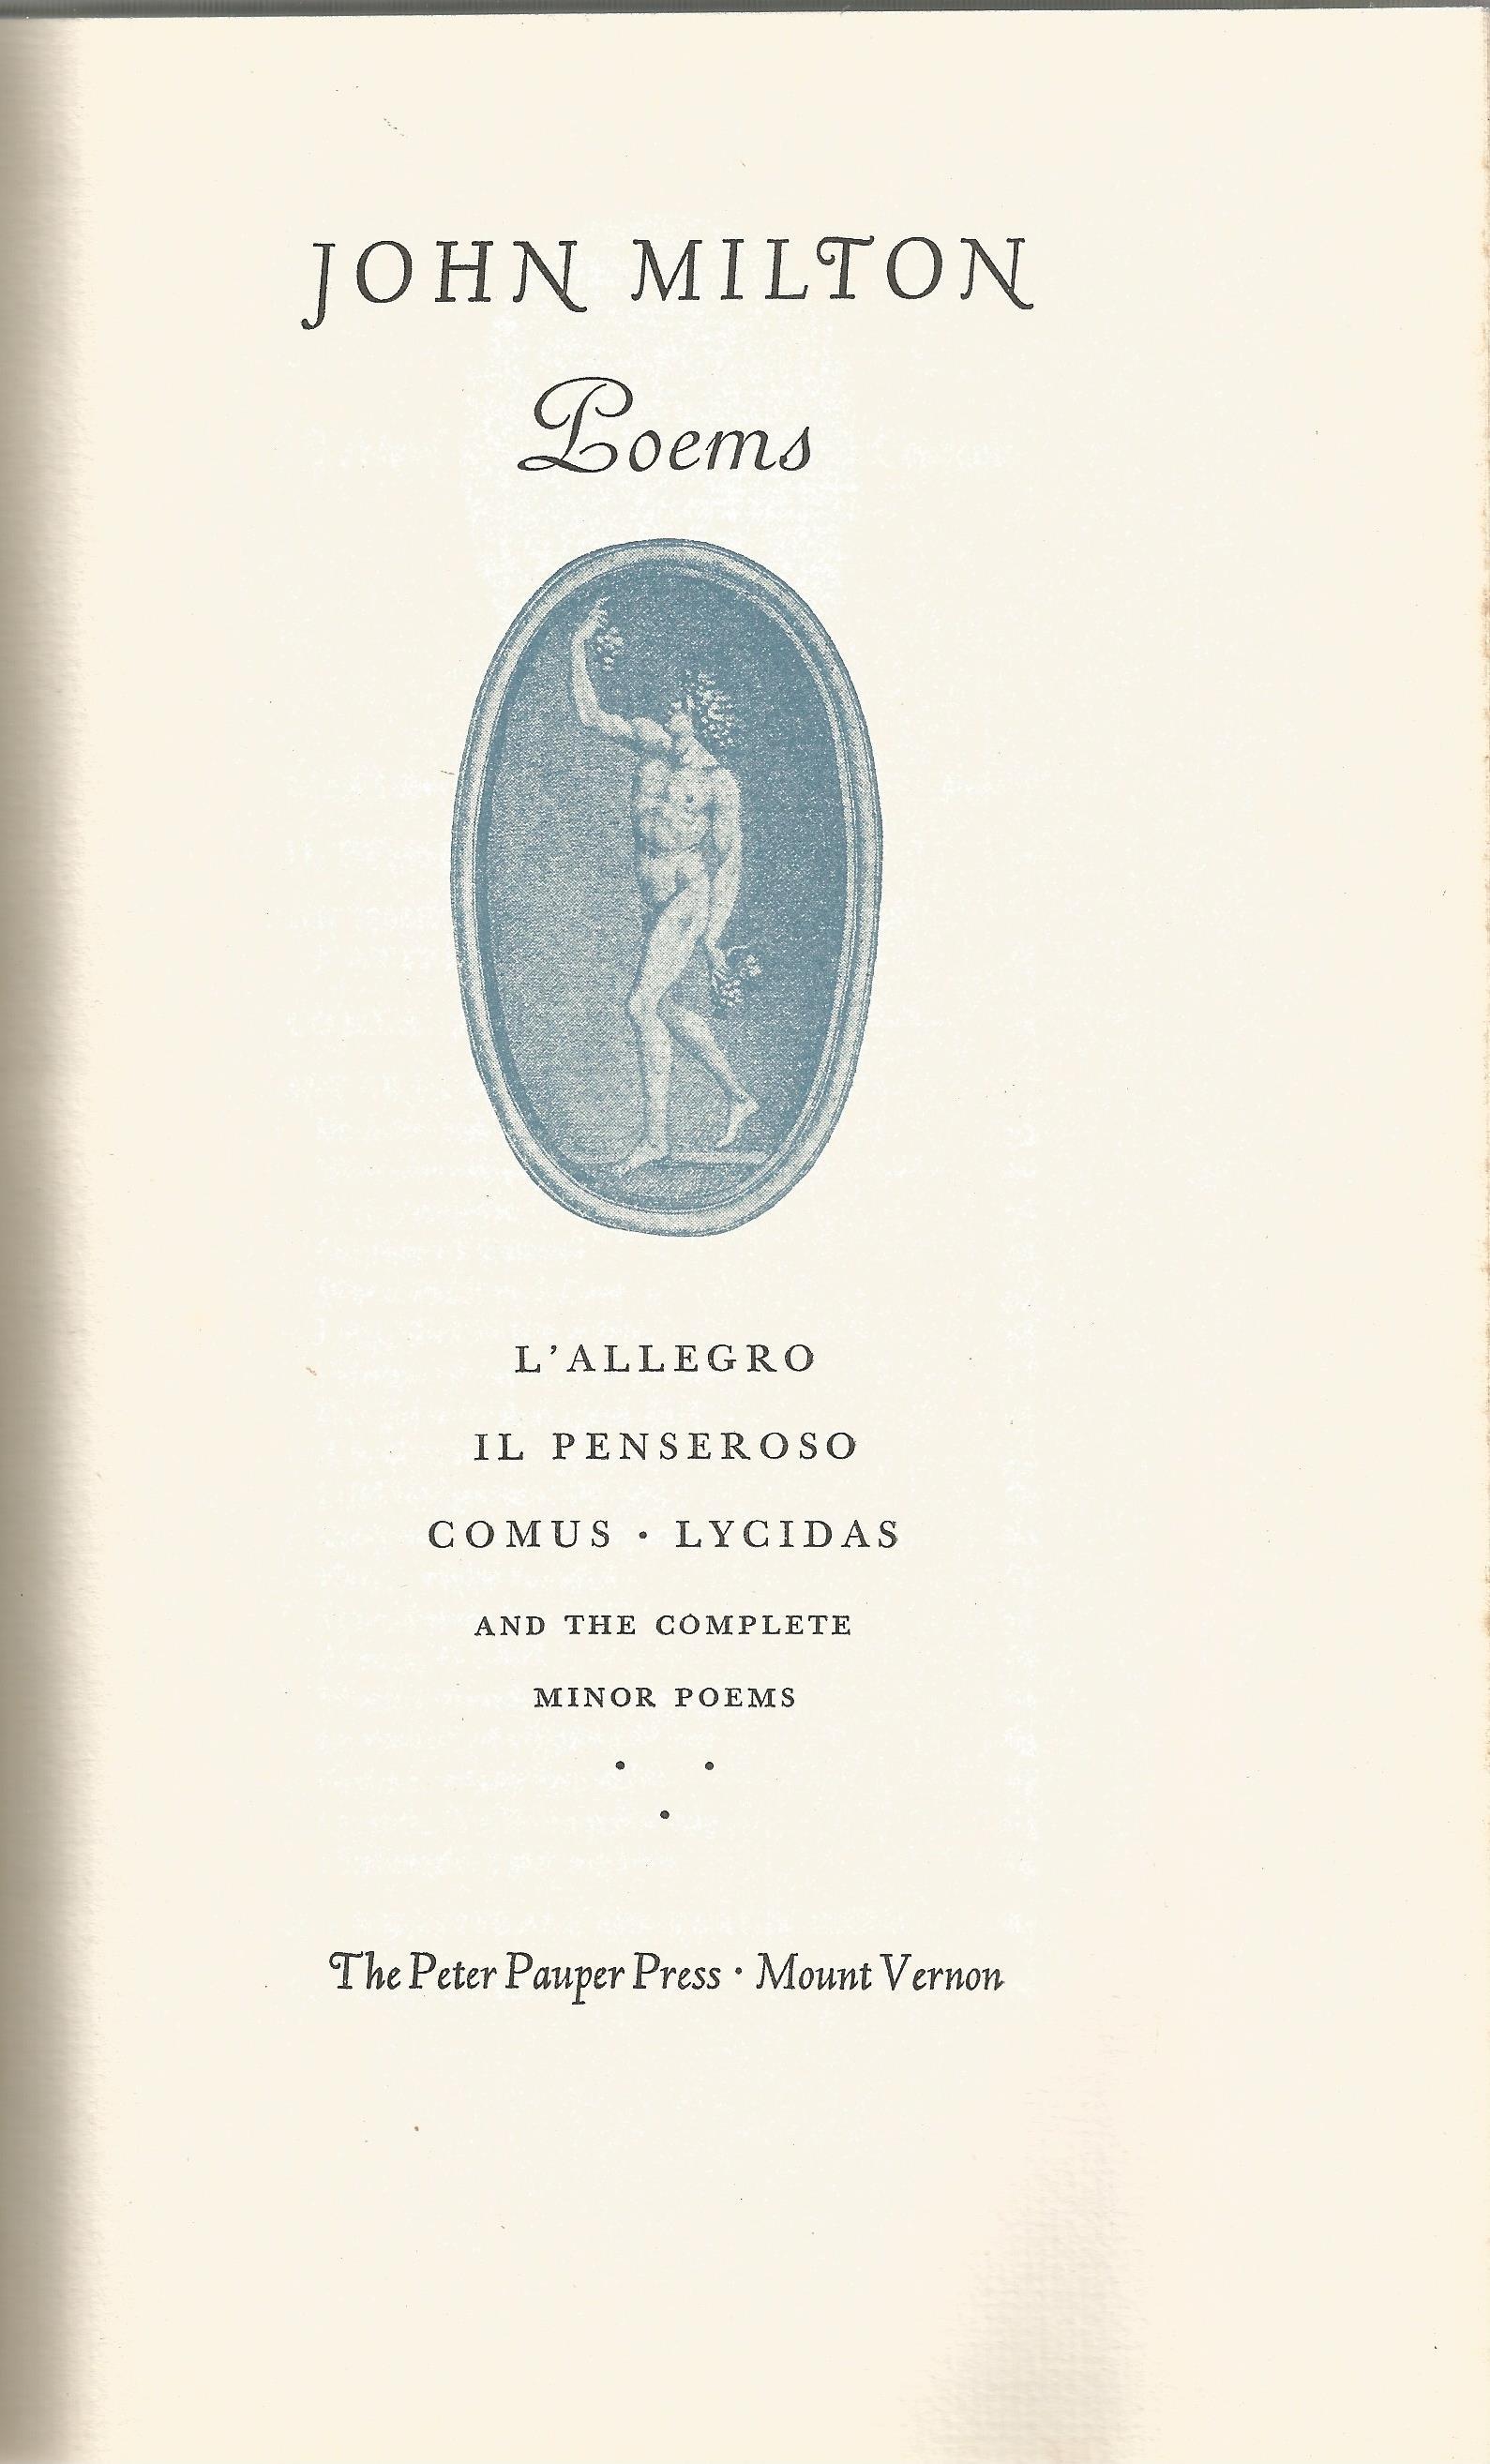 Hardback Book John Milton Poems L'Allegro, Il Penseroso, Comus Lycidas published by The Peter Pauper - Image 2 of 3